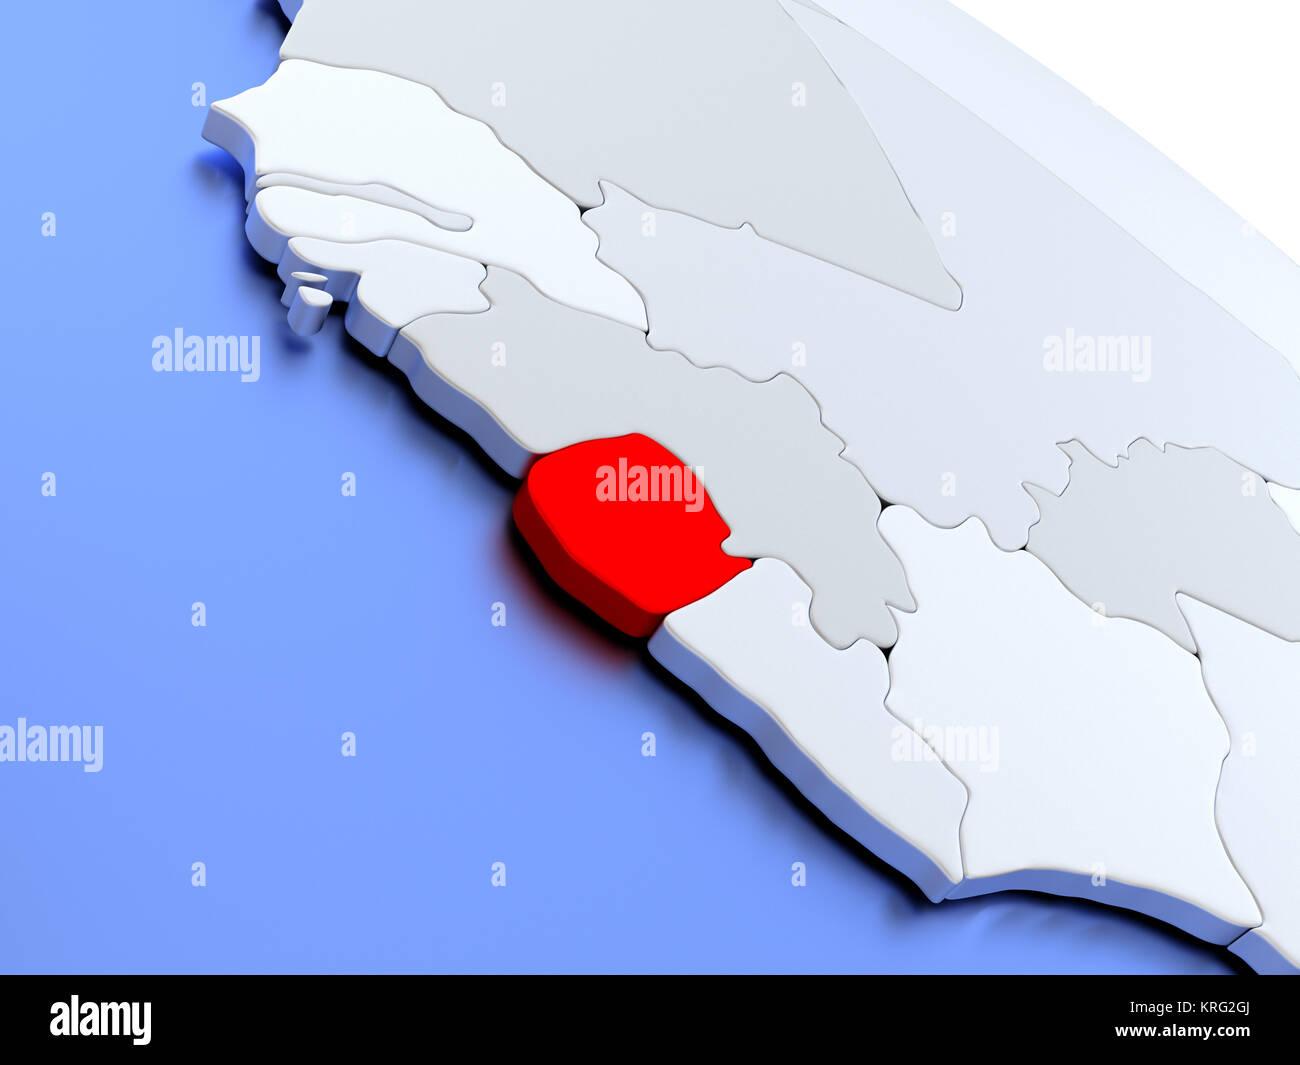 Sierra Leone On World Map Stock Photo 169383666 Alamy